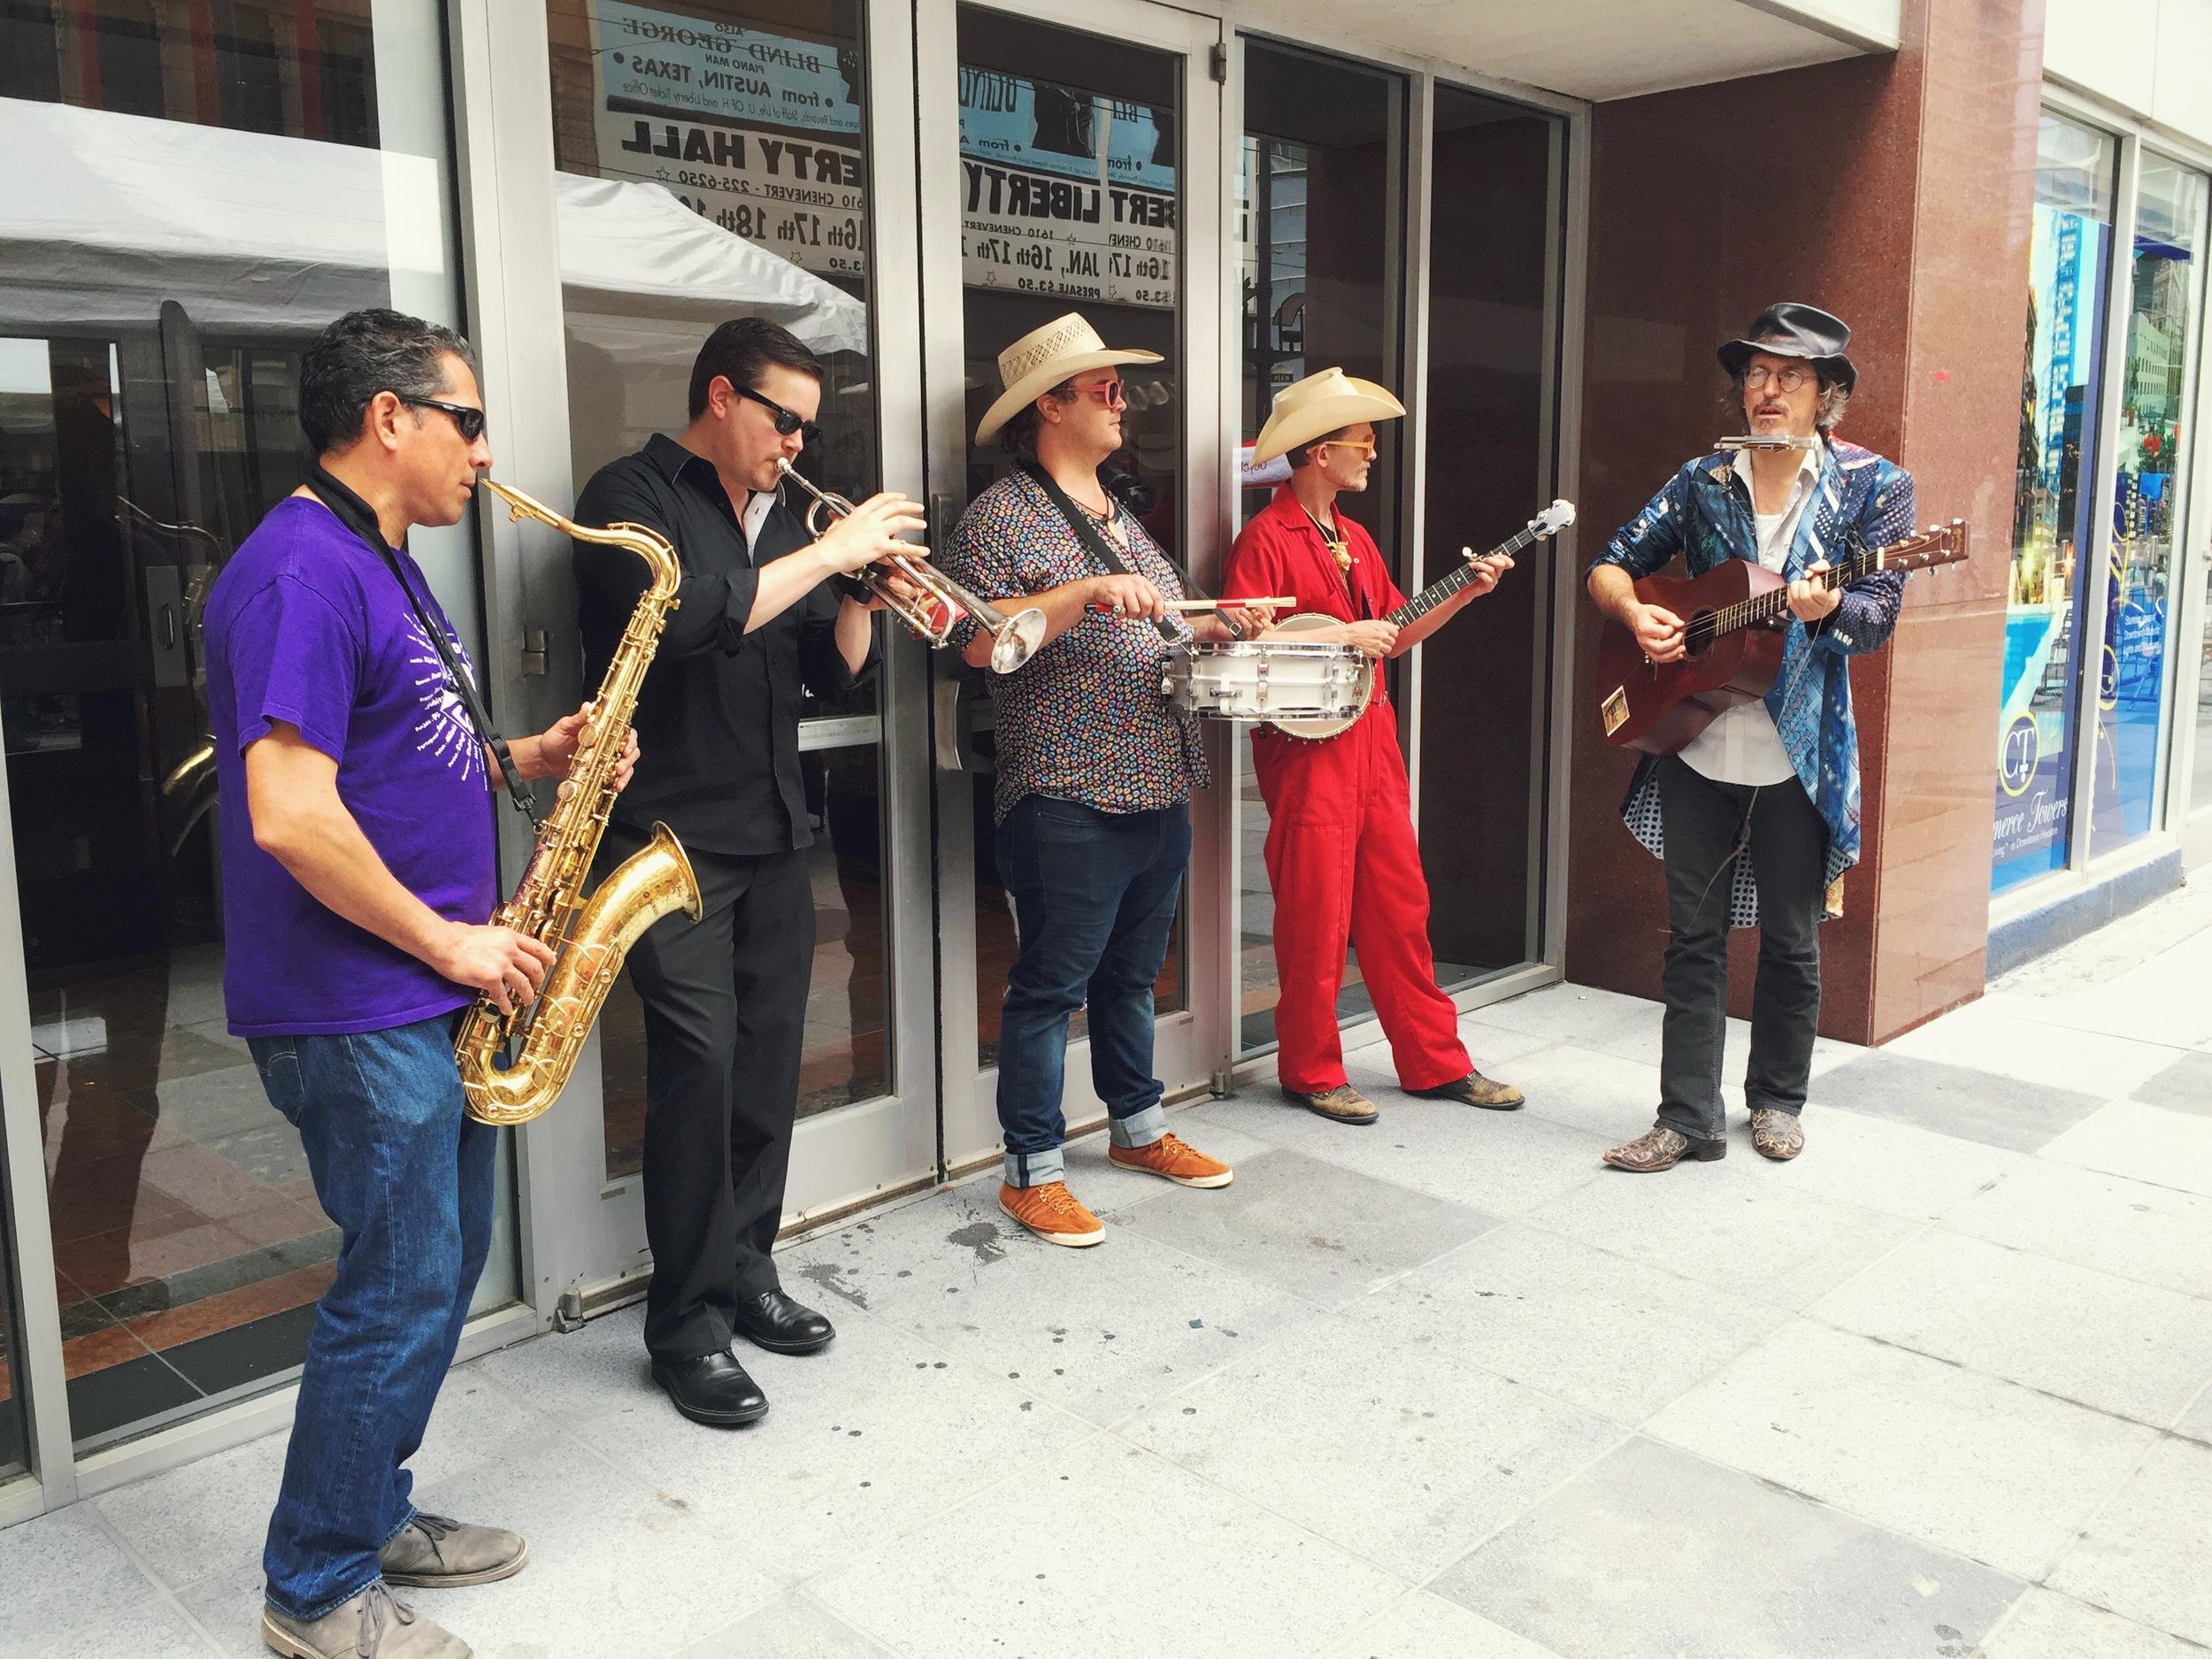 Craig Kinsey and His Traveling Band